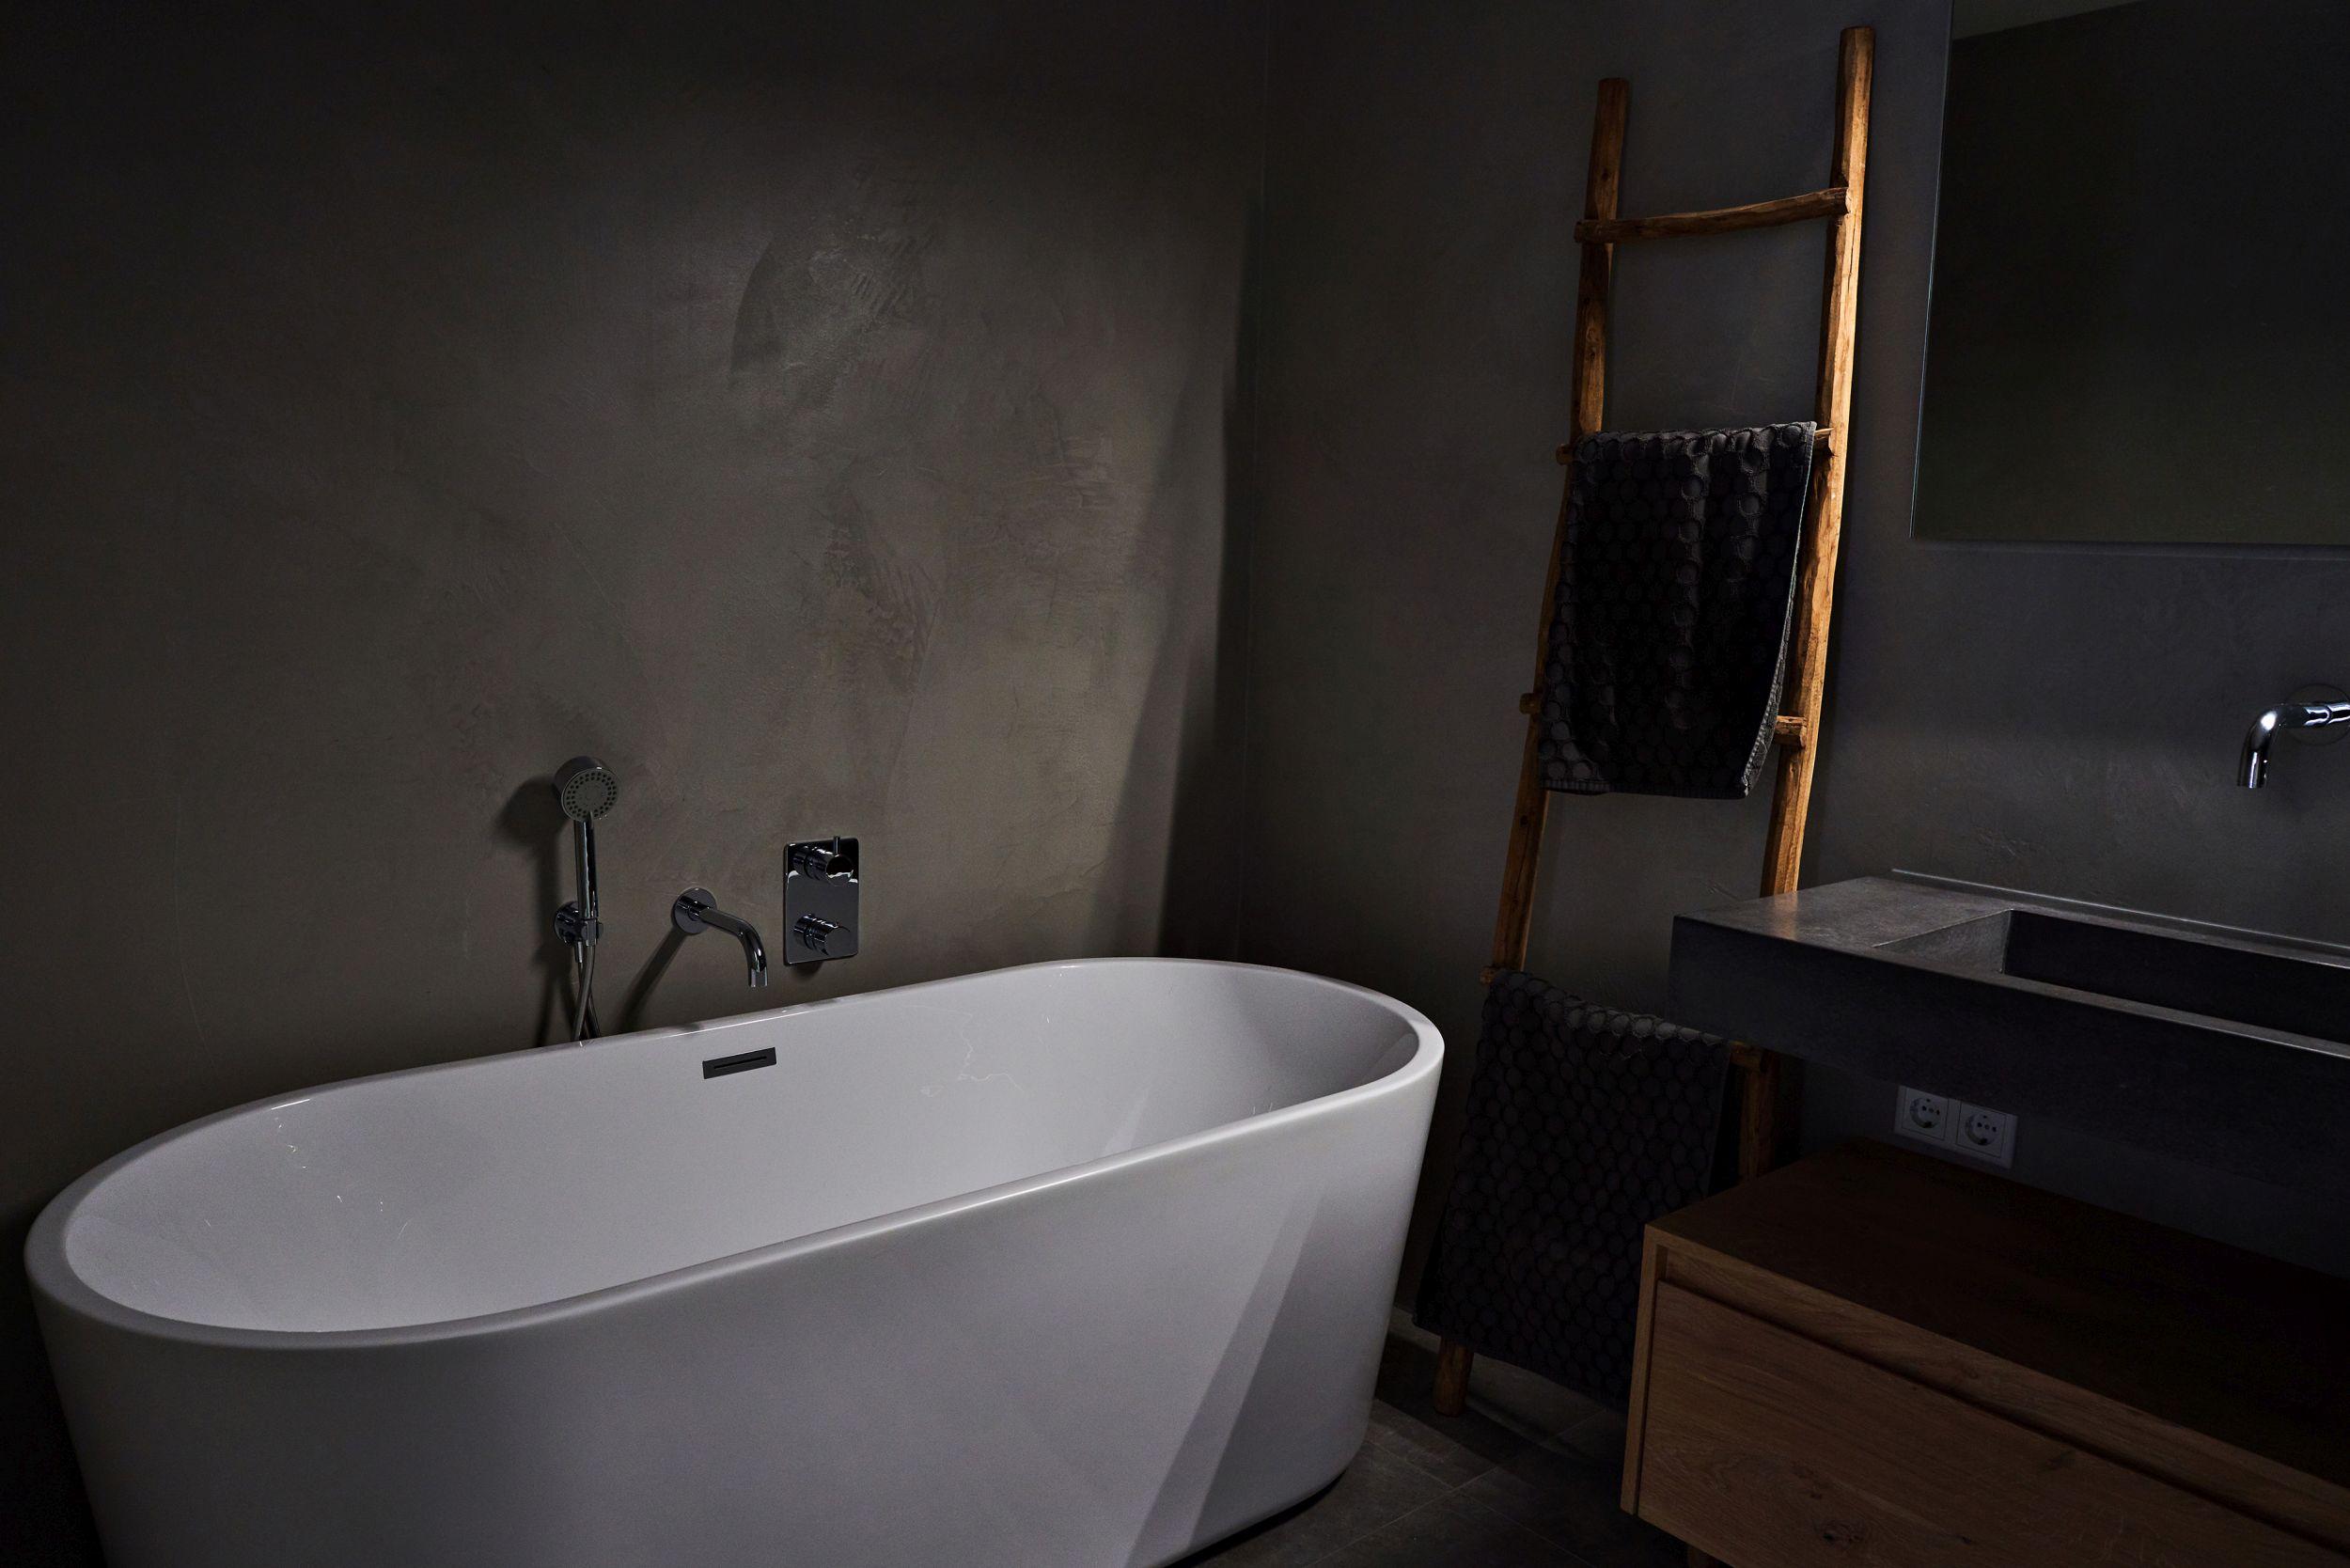 Onwijs Badkamer stucwerk in exclusieve stijl en pure kwaliteit | Erik Spakman OJ-07